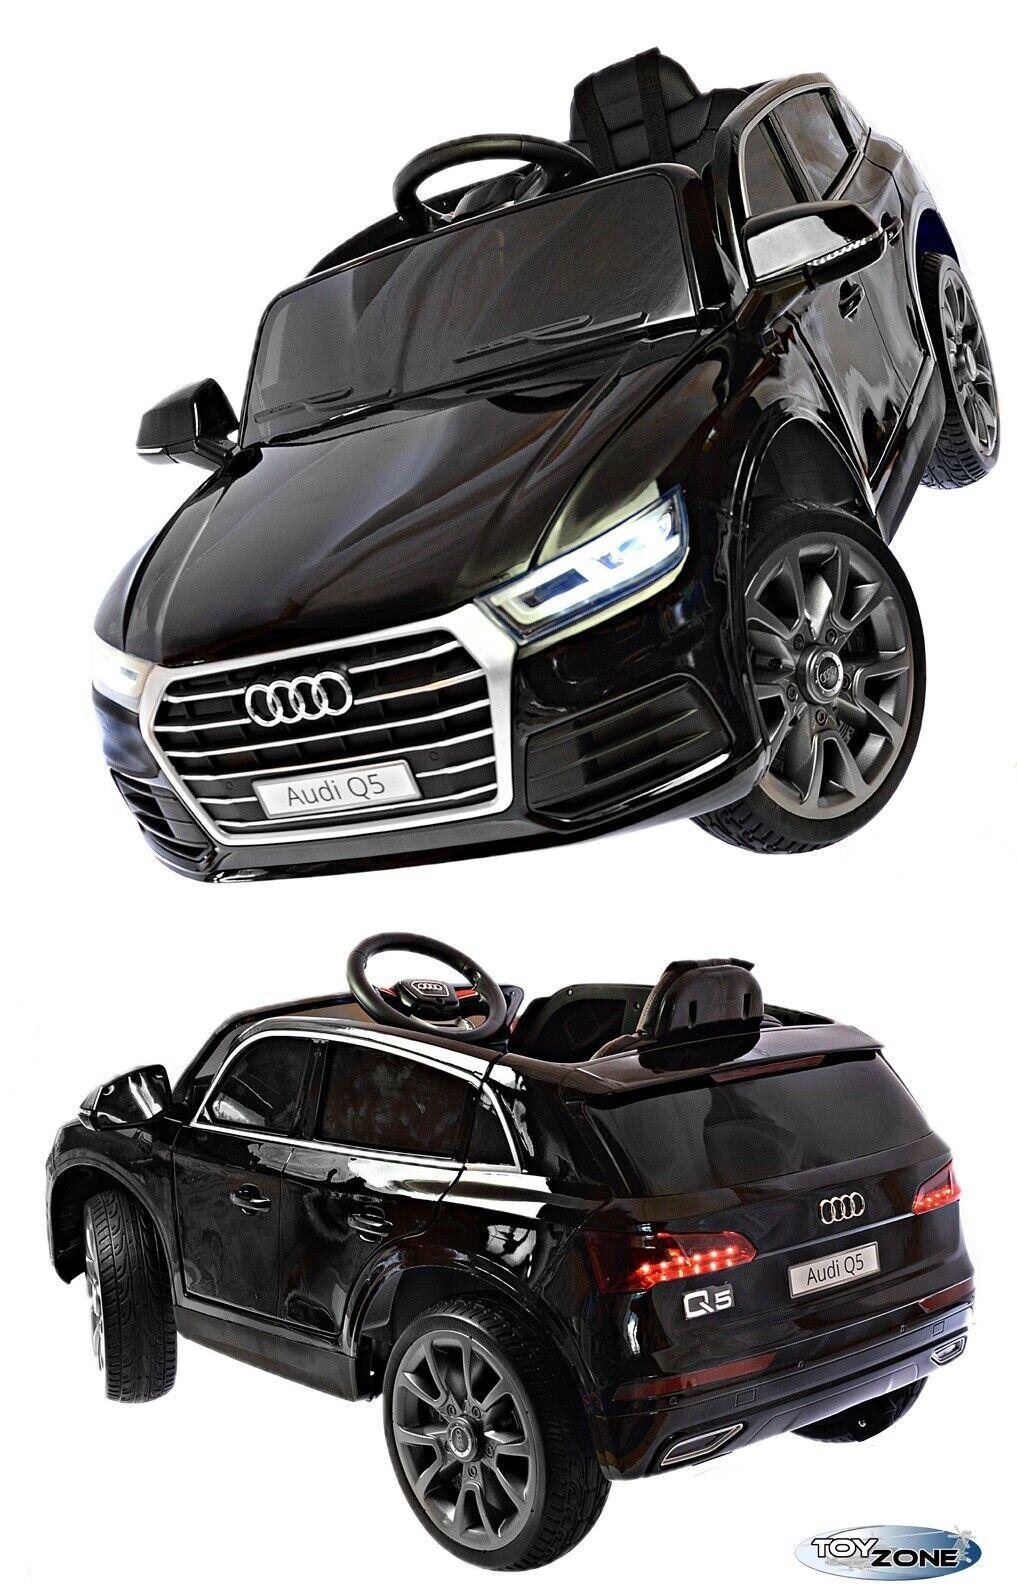 Kinderfahrzeug 12V 12V 12V Kinder Elektro Auto Audi Q5 Kinderauto Gummiräder Ledersitz 2bdf54